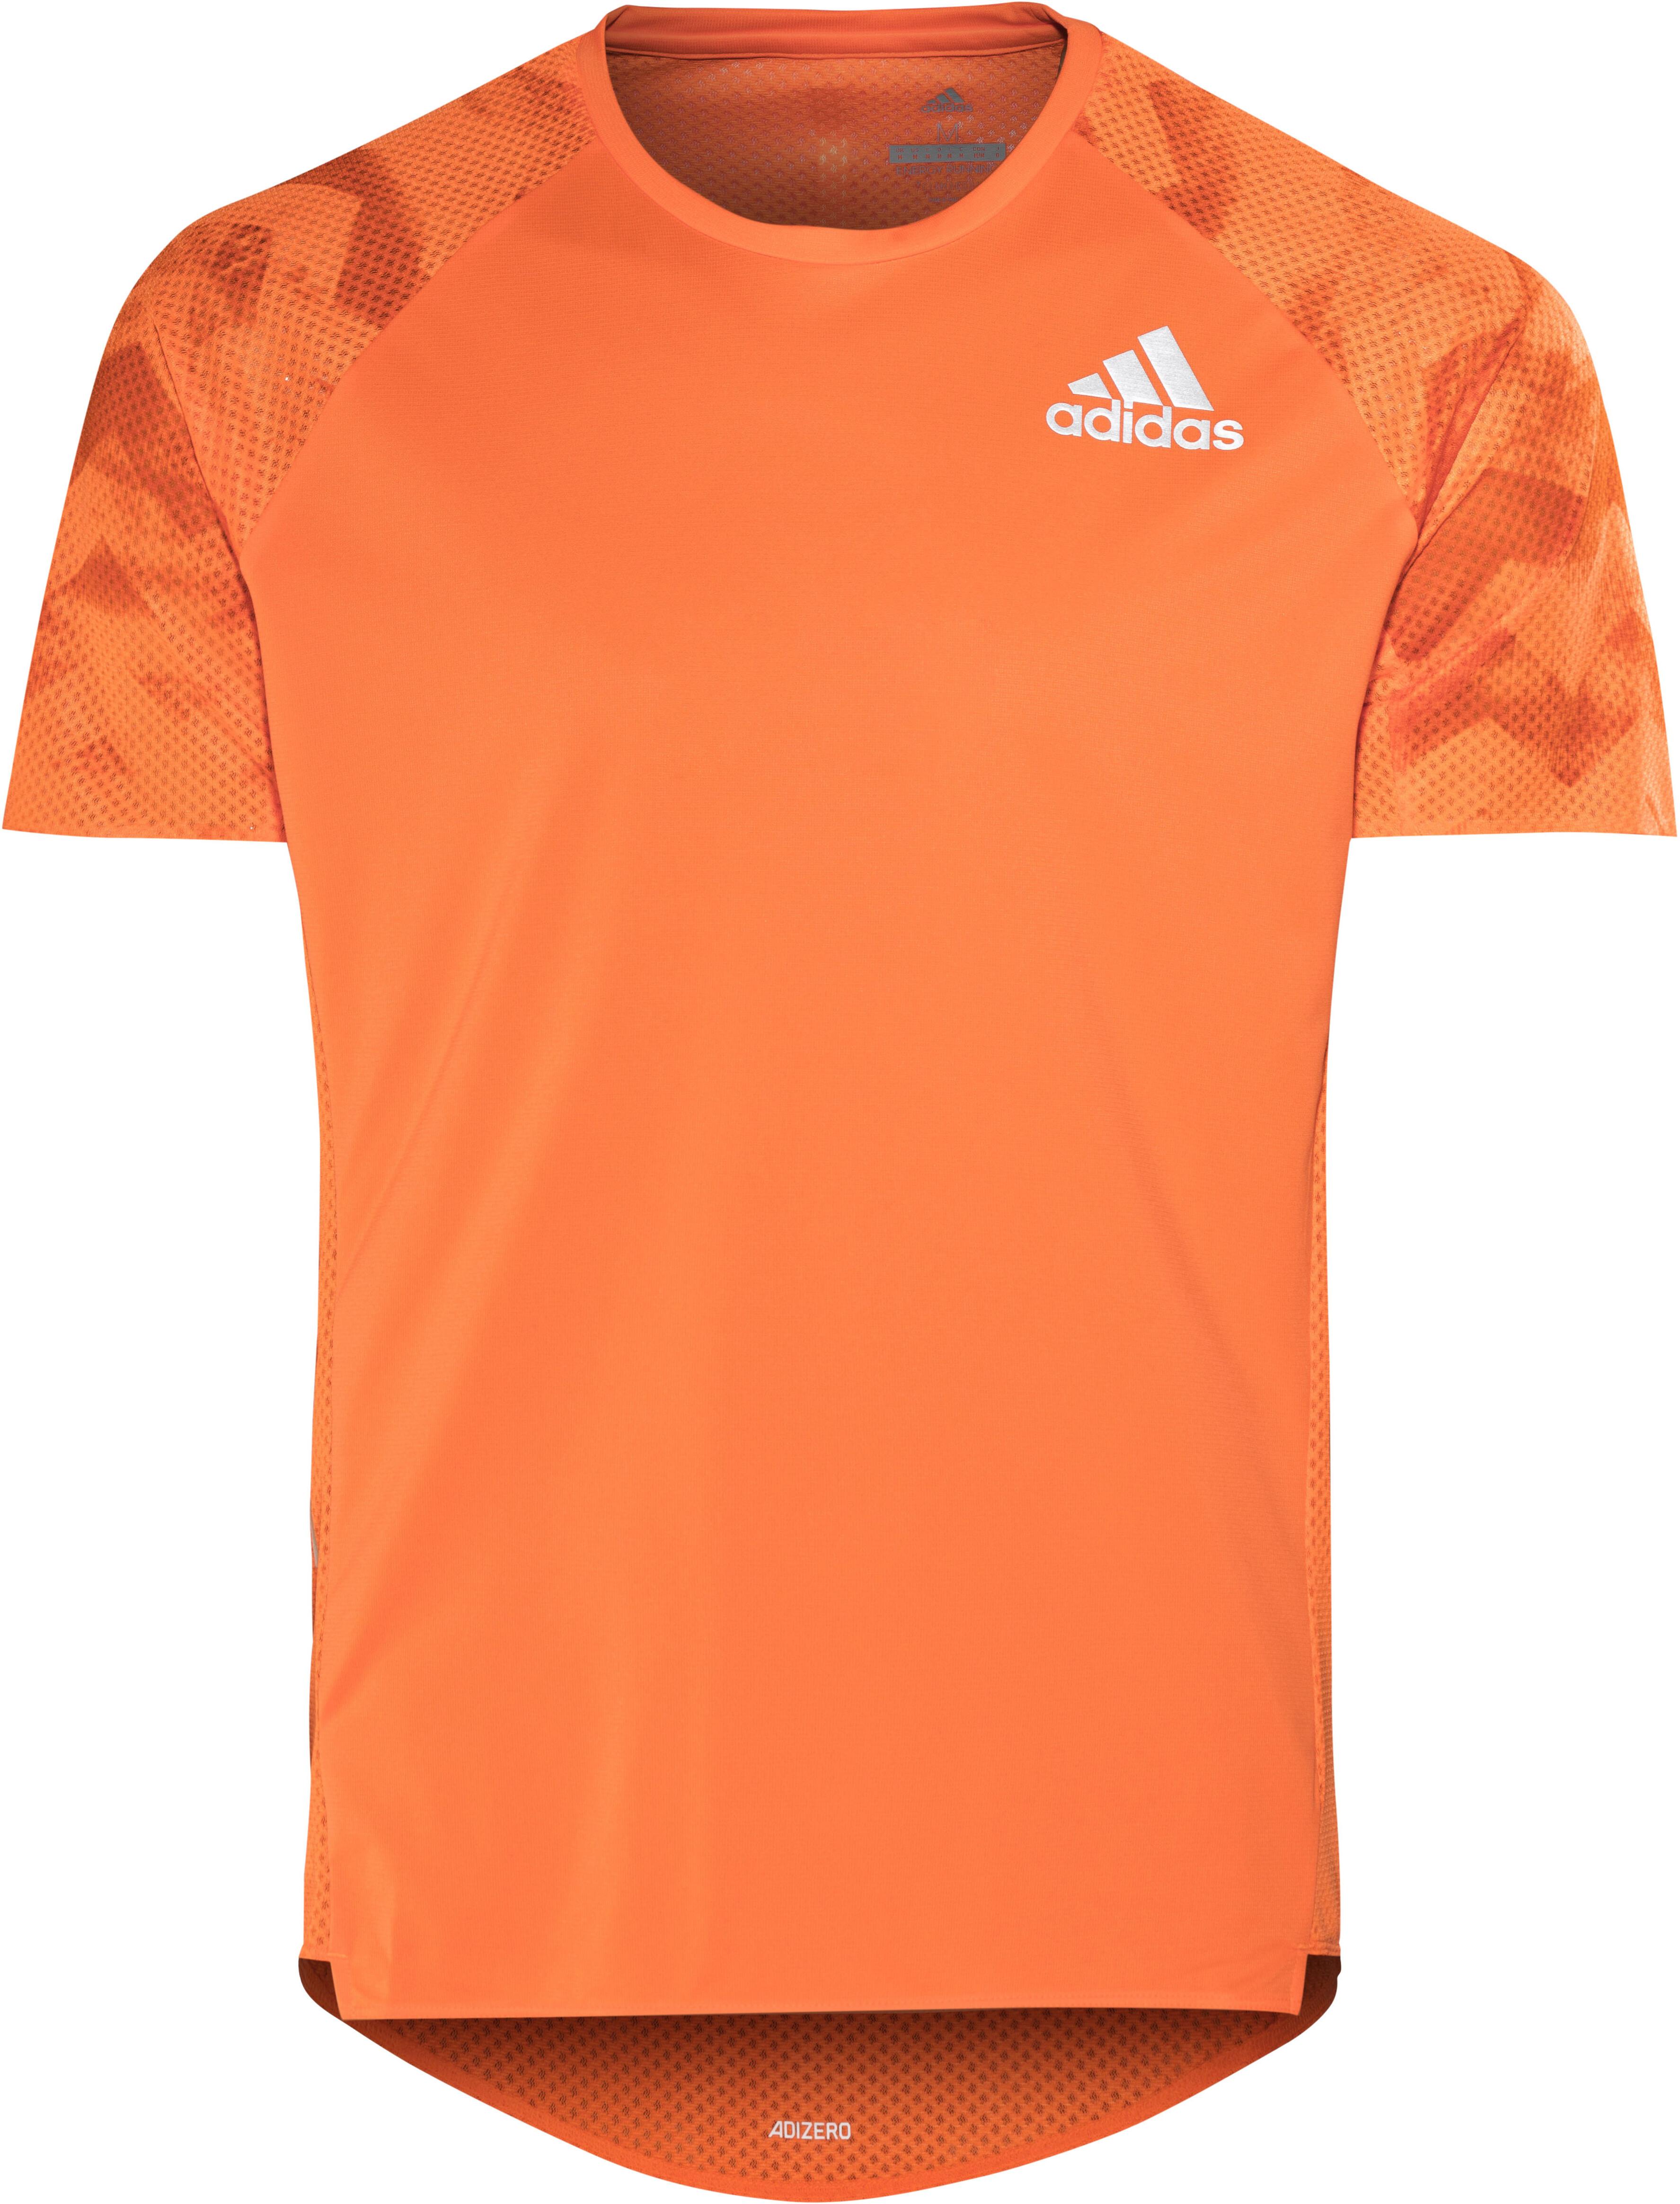 9381f3d27d0f7 adidas AdiZero - Camiseta Running Hombre - naranja